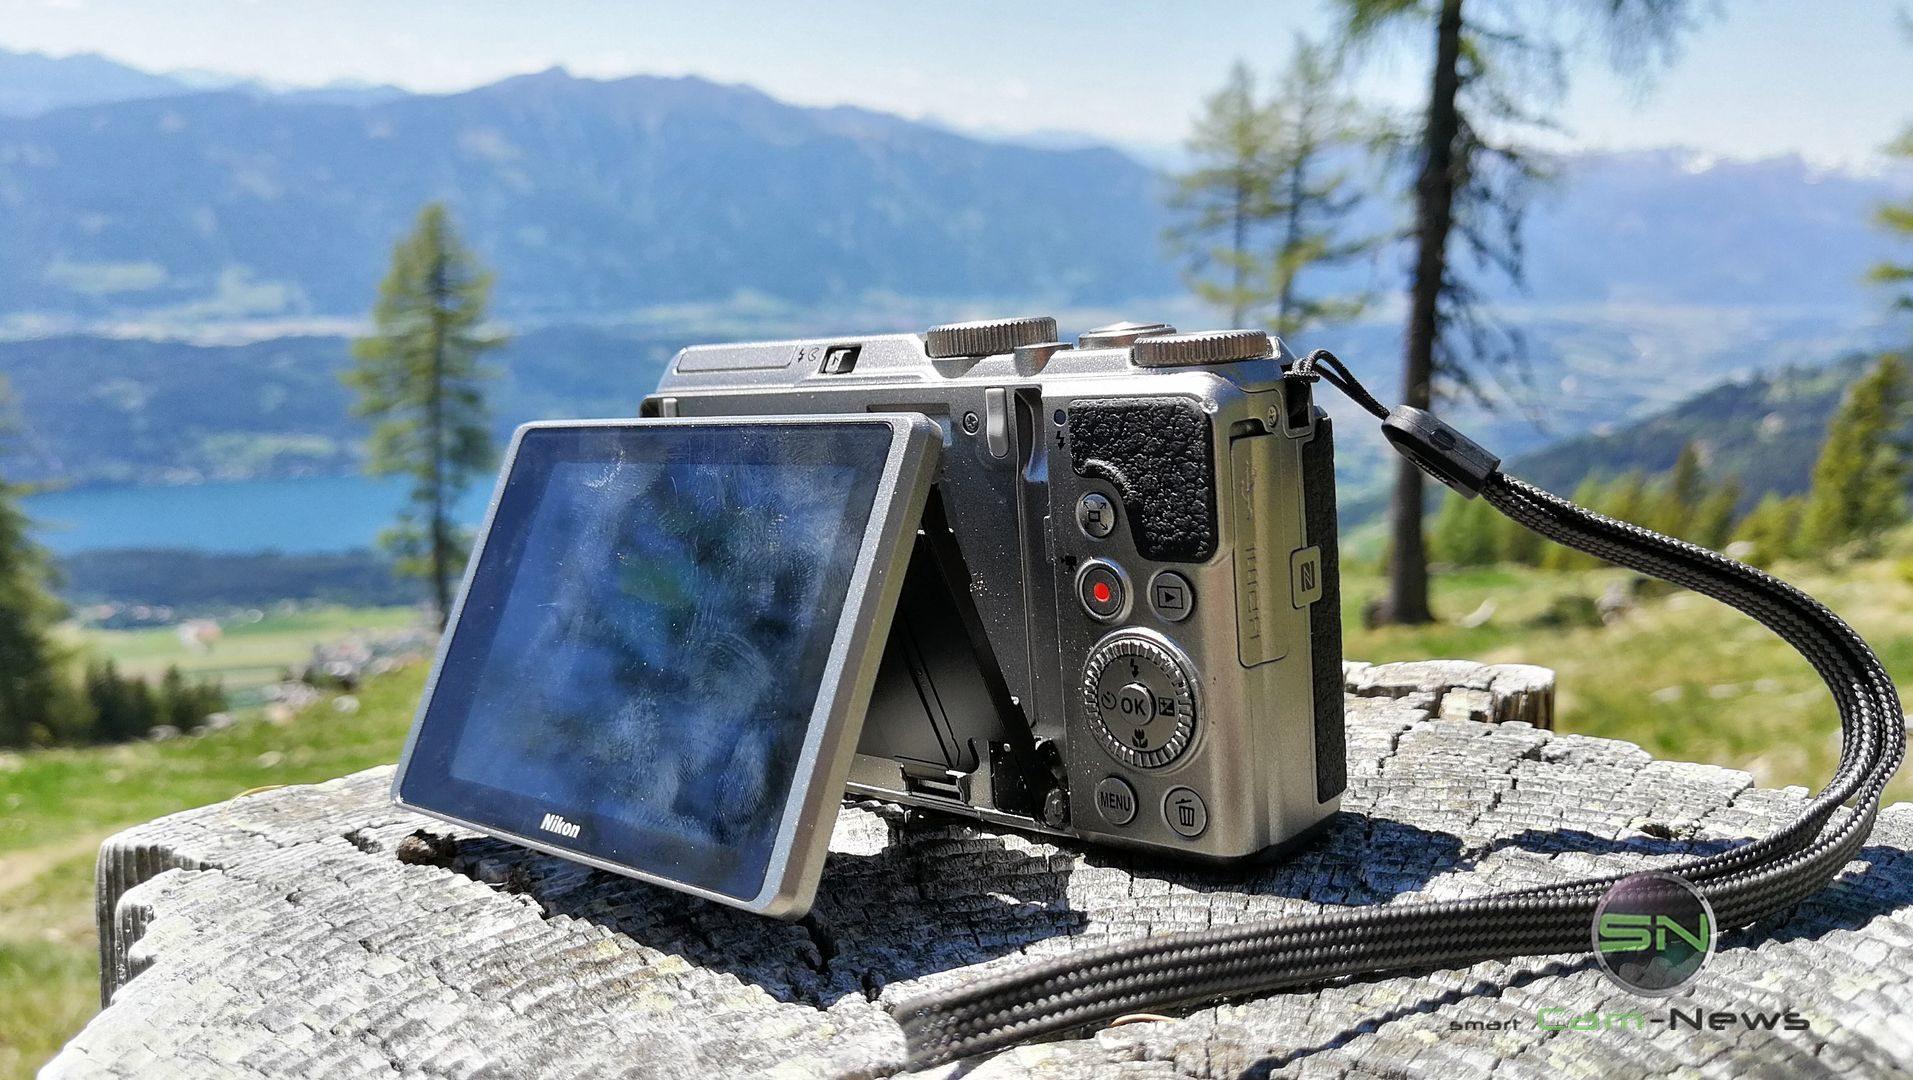 Klappdisplay Position 1 - Nikon Coolpix A900 MegaZoom - Millstättersee - SmartCamNews